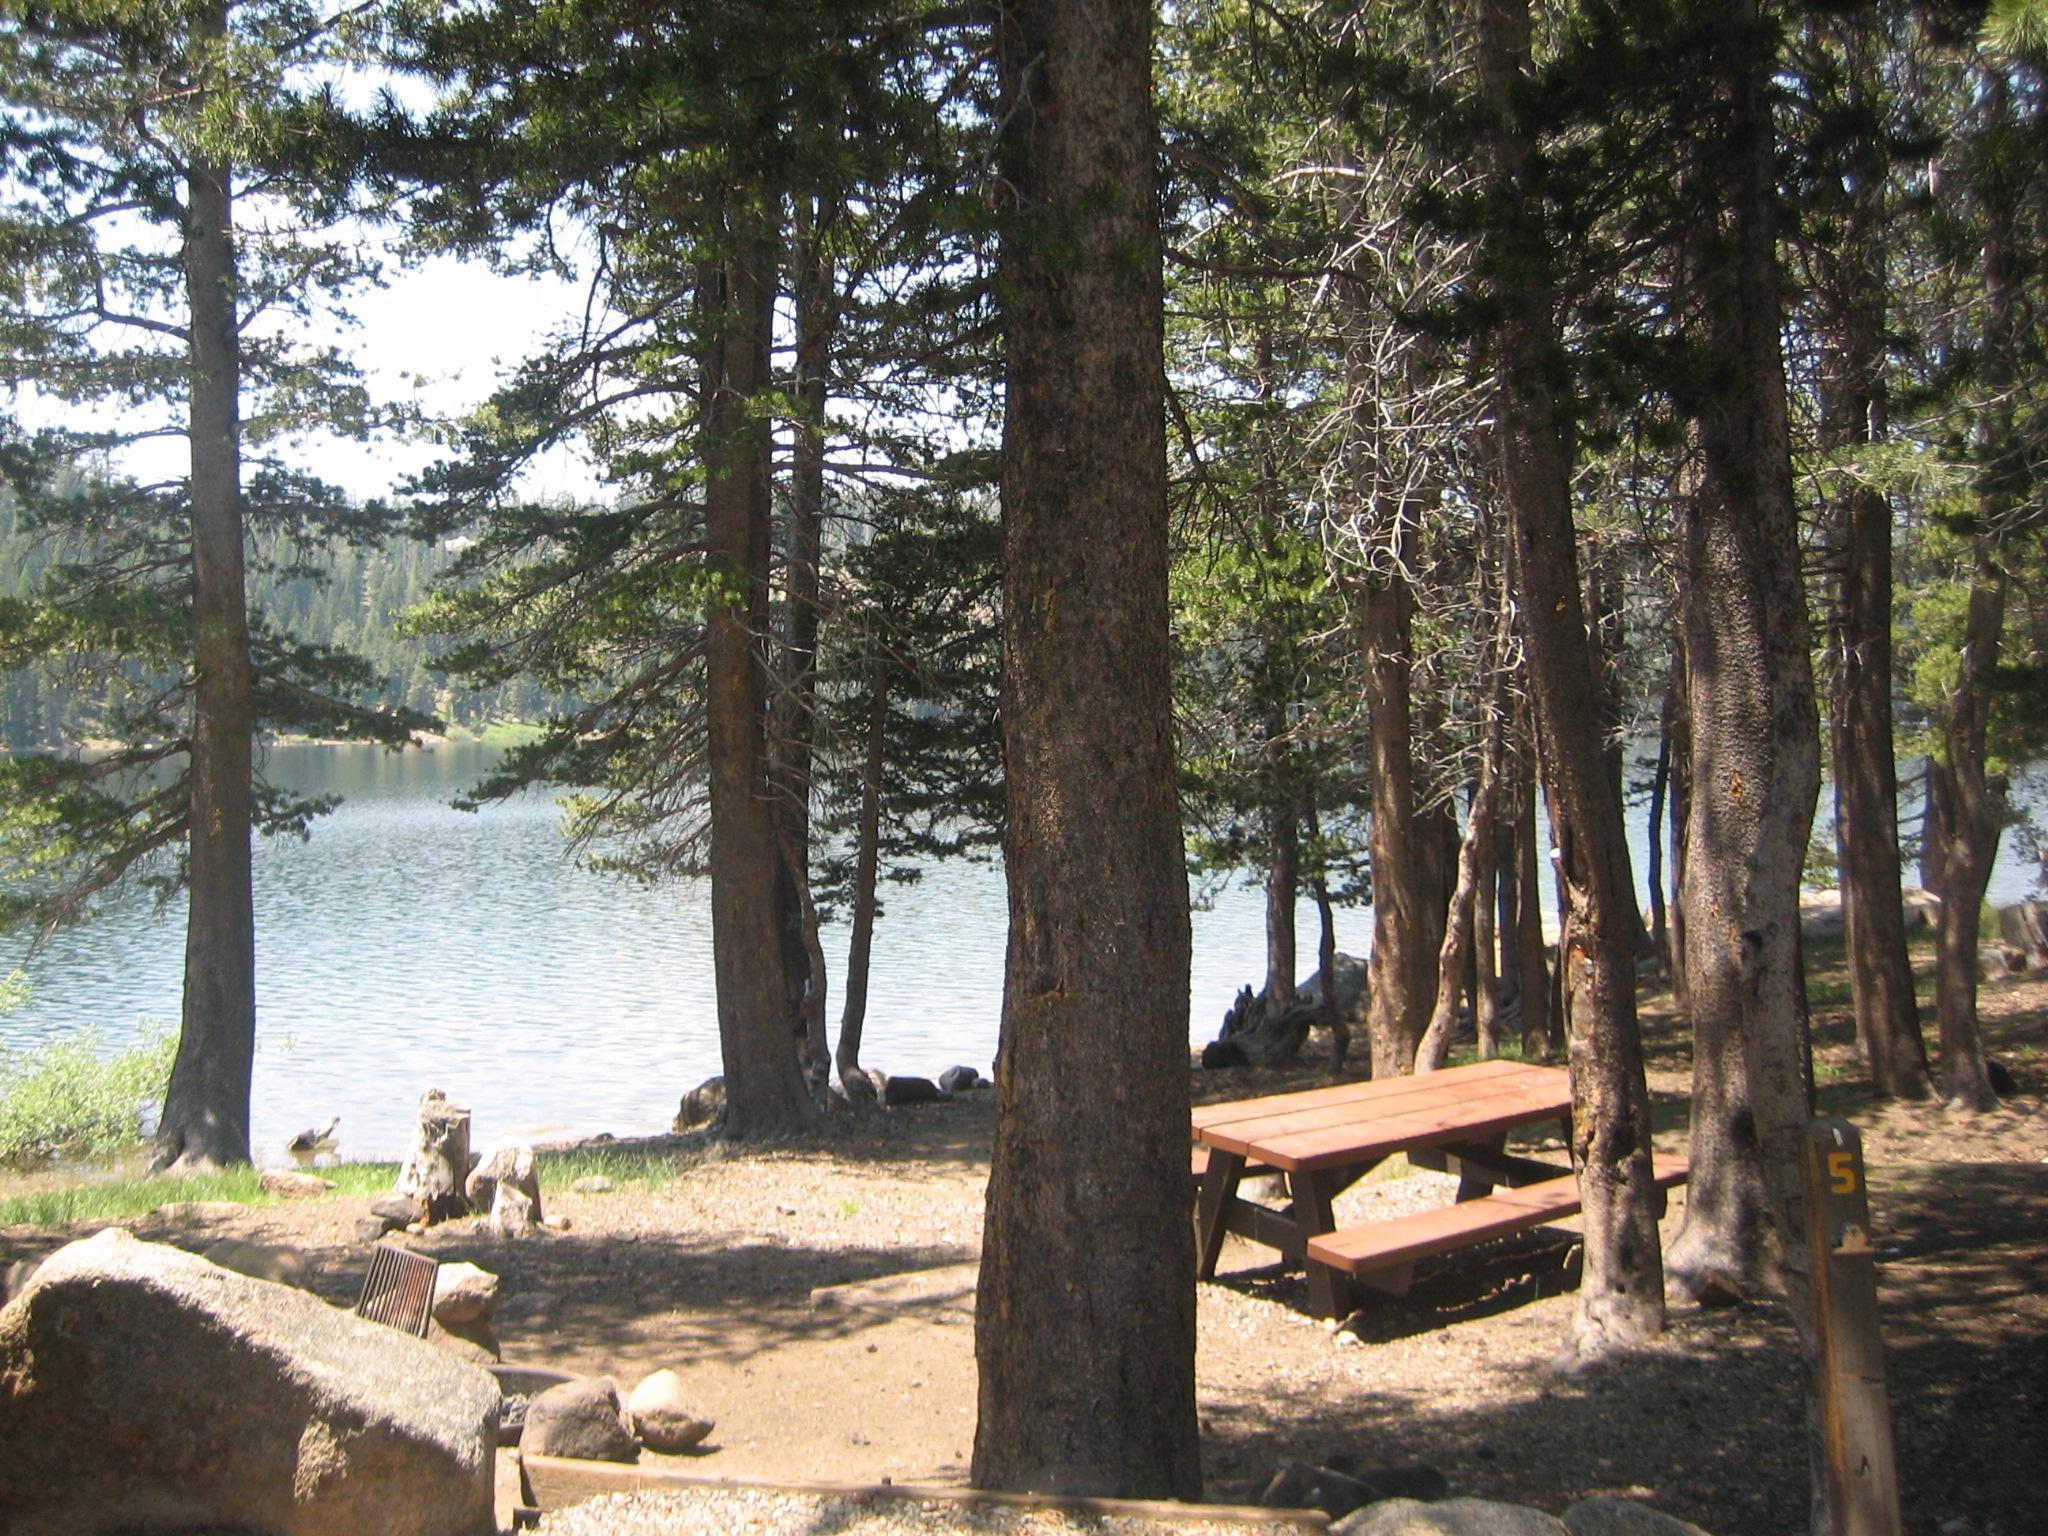 Towering pines provide shade